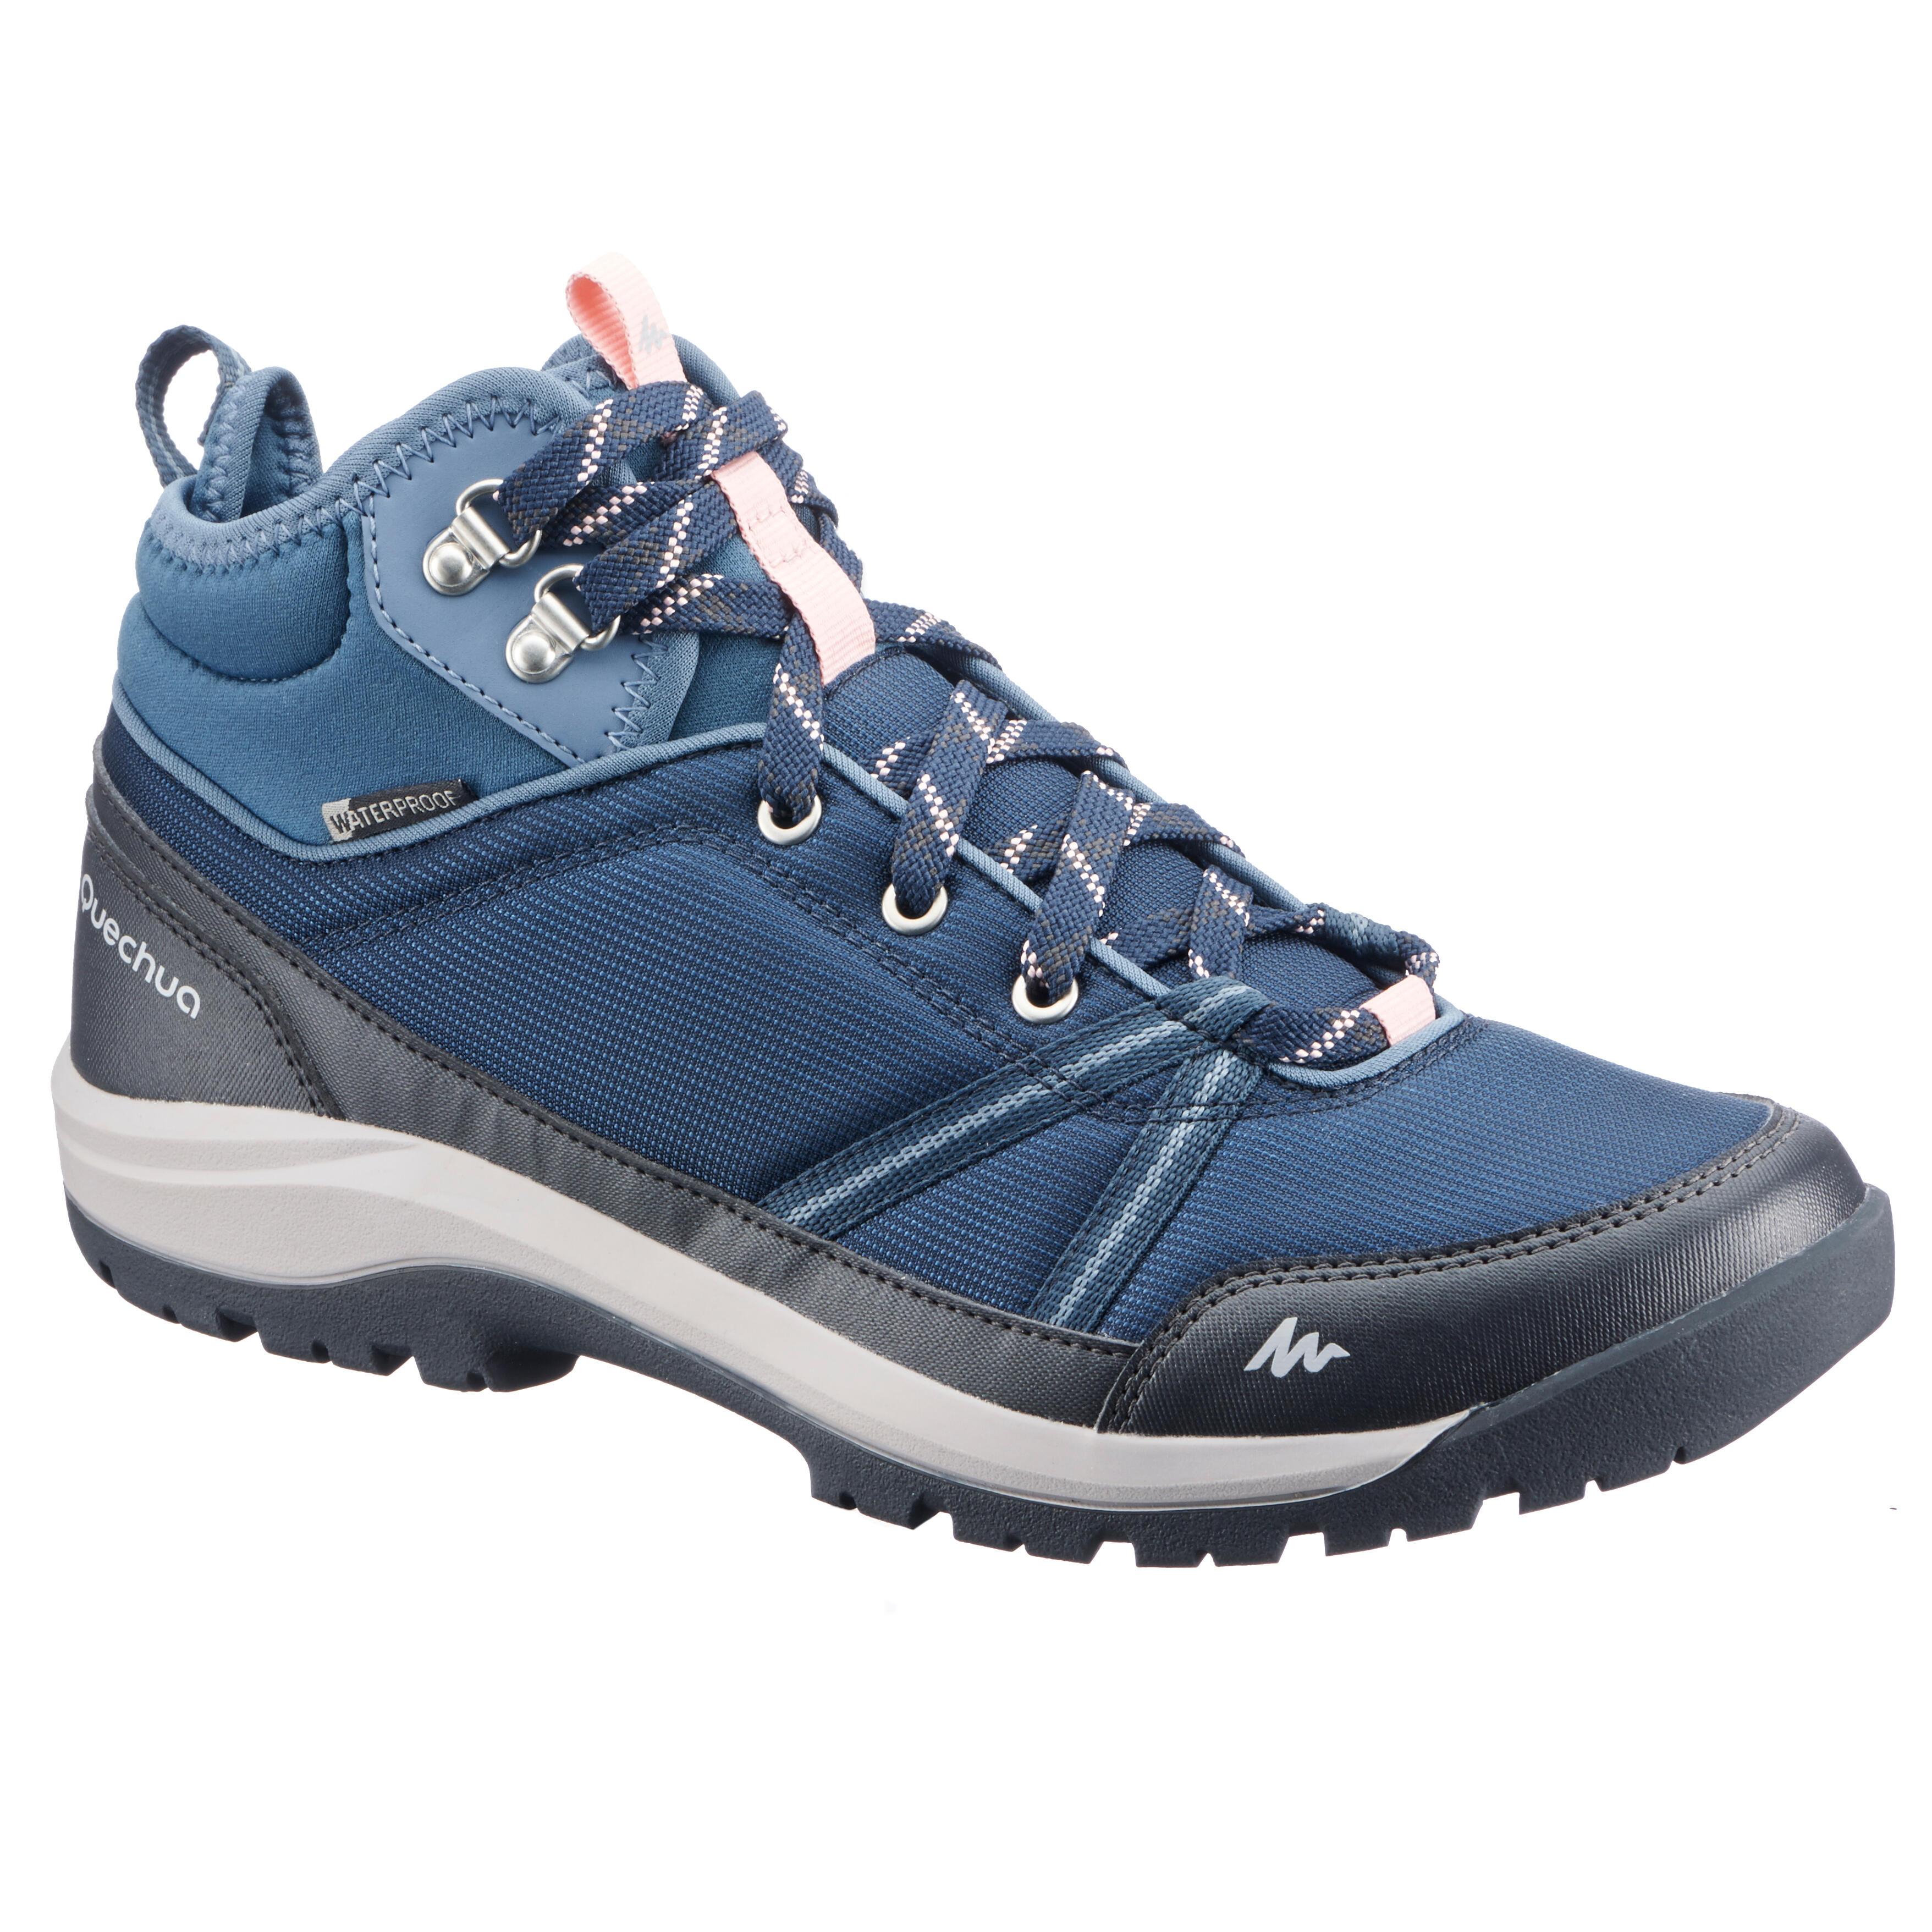 Women's Hiking Shoes | Waterproof